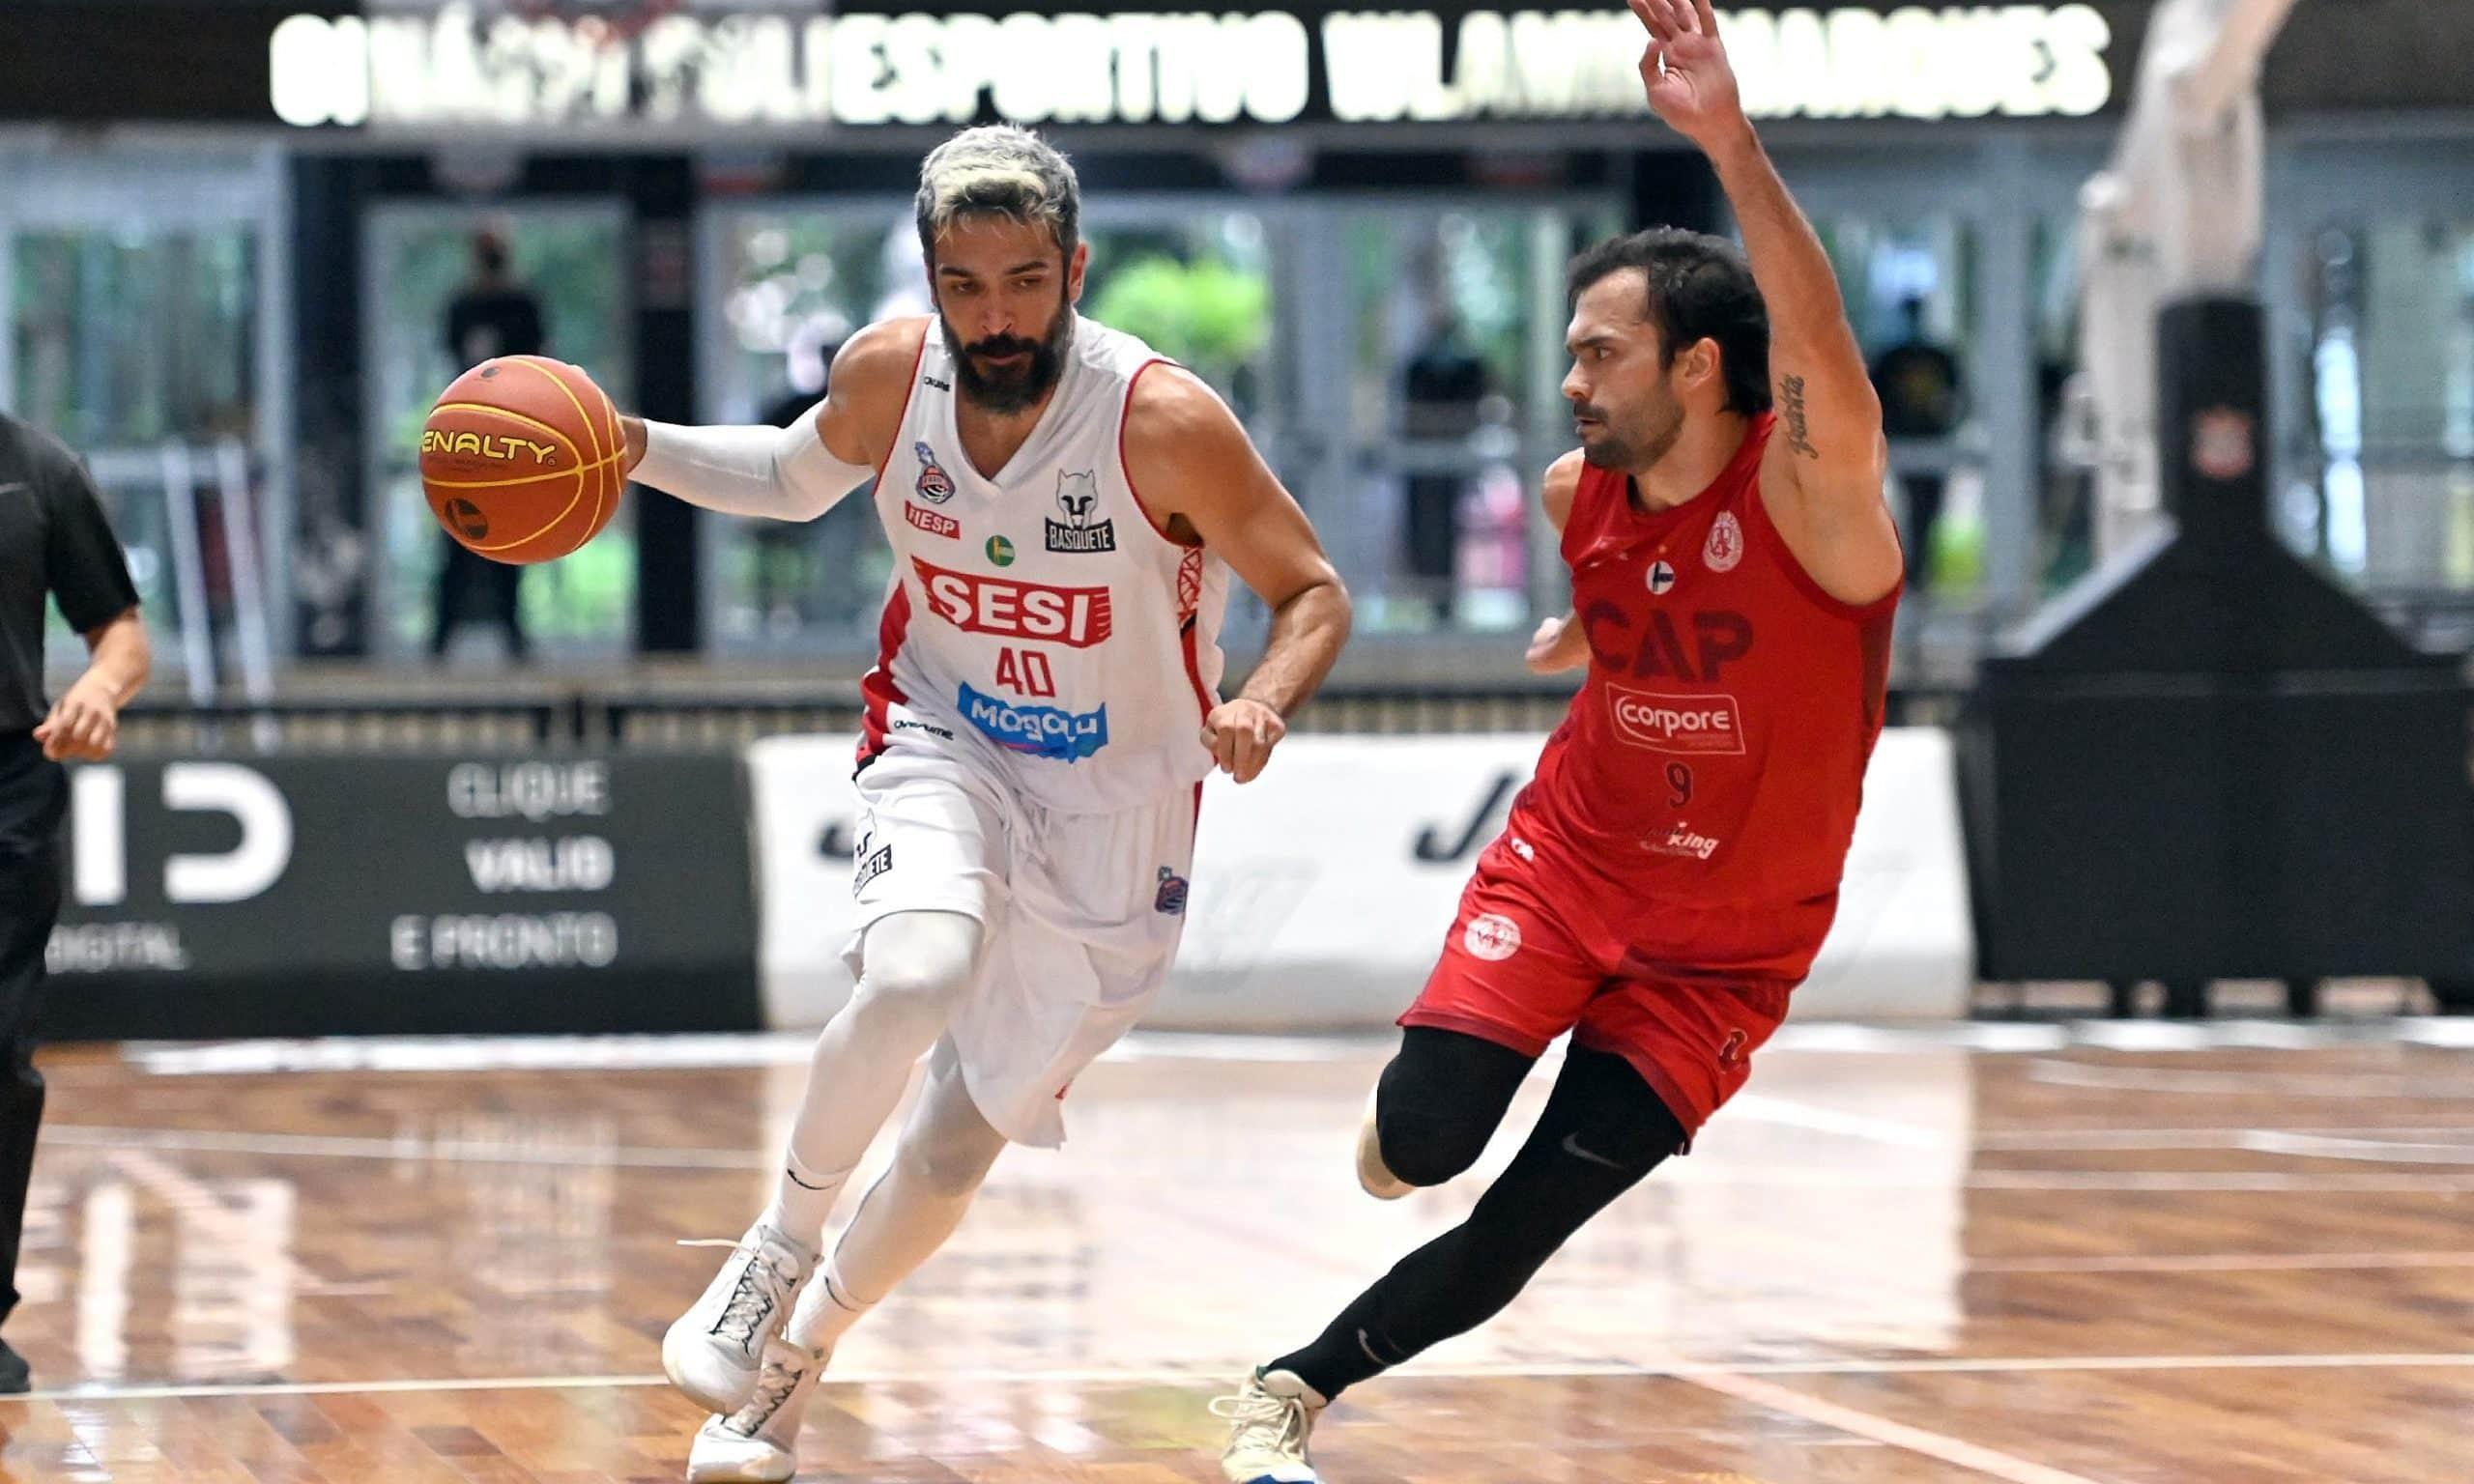 André Góes Franca Deryk Paulistano NBB basquete masculino